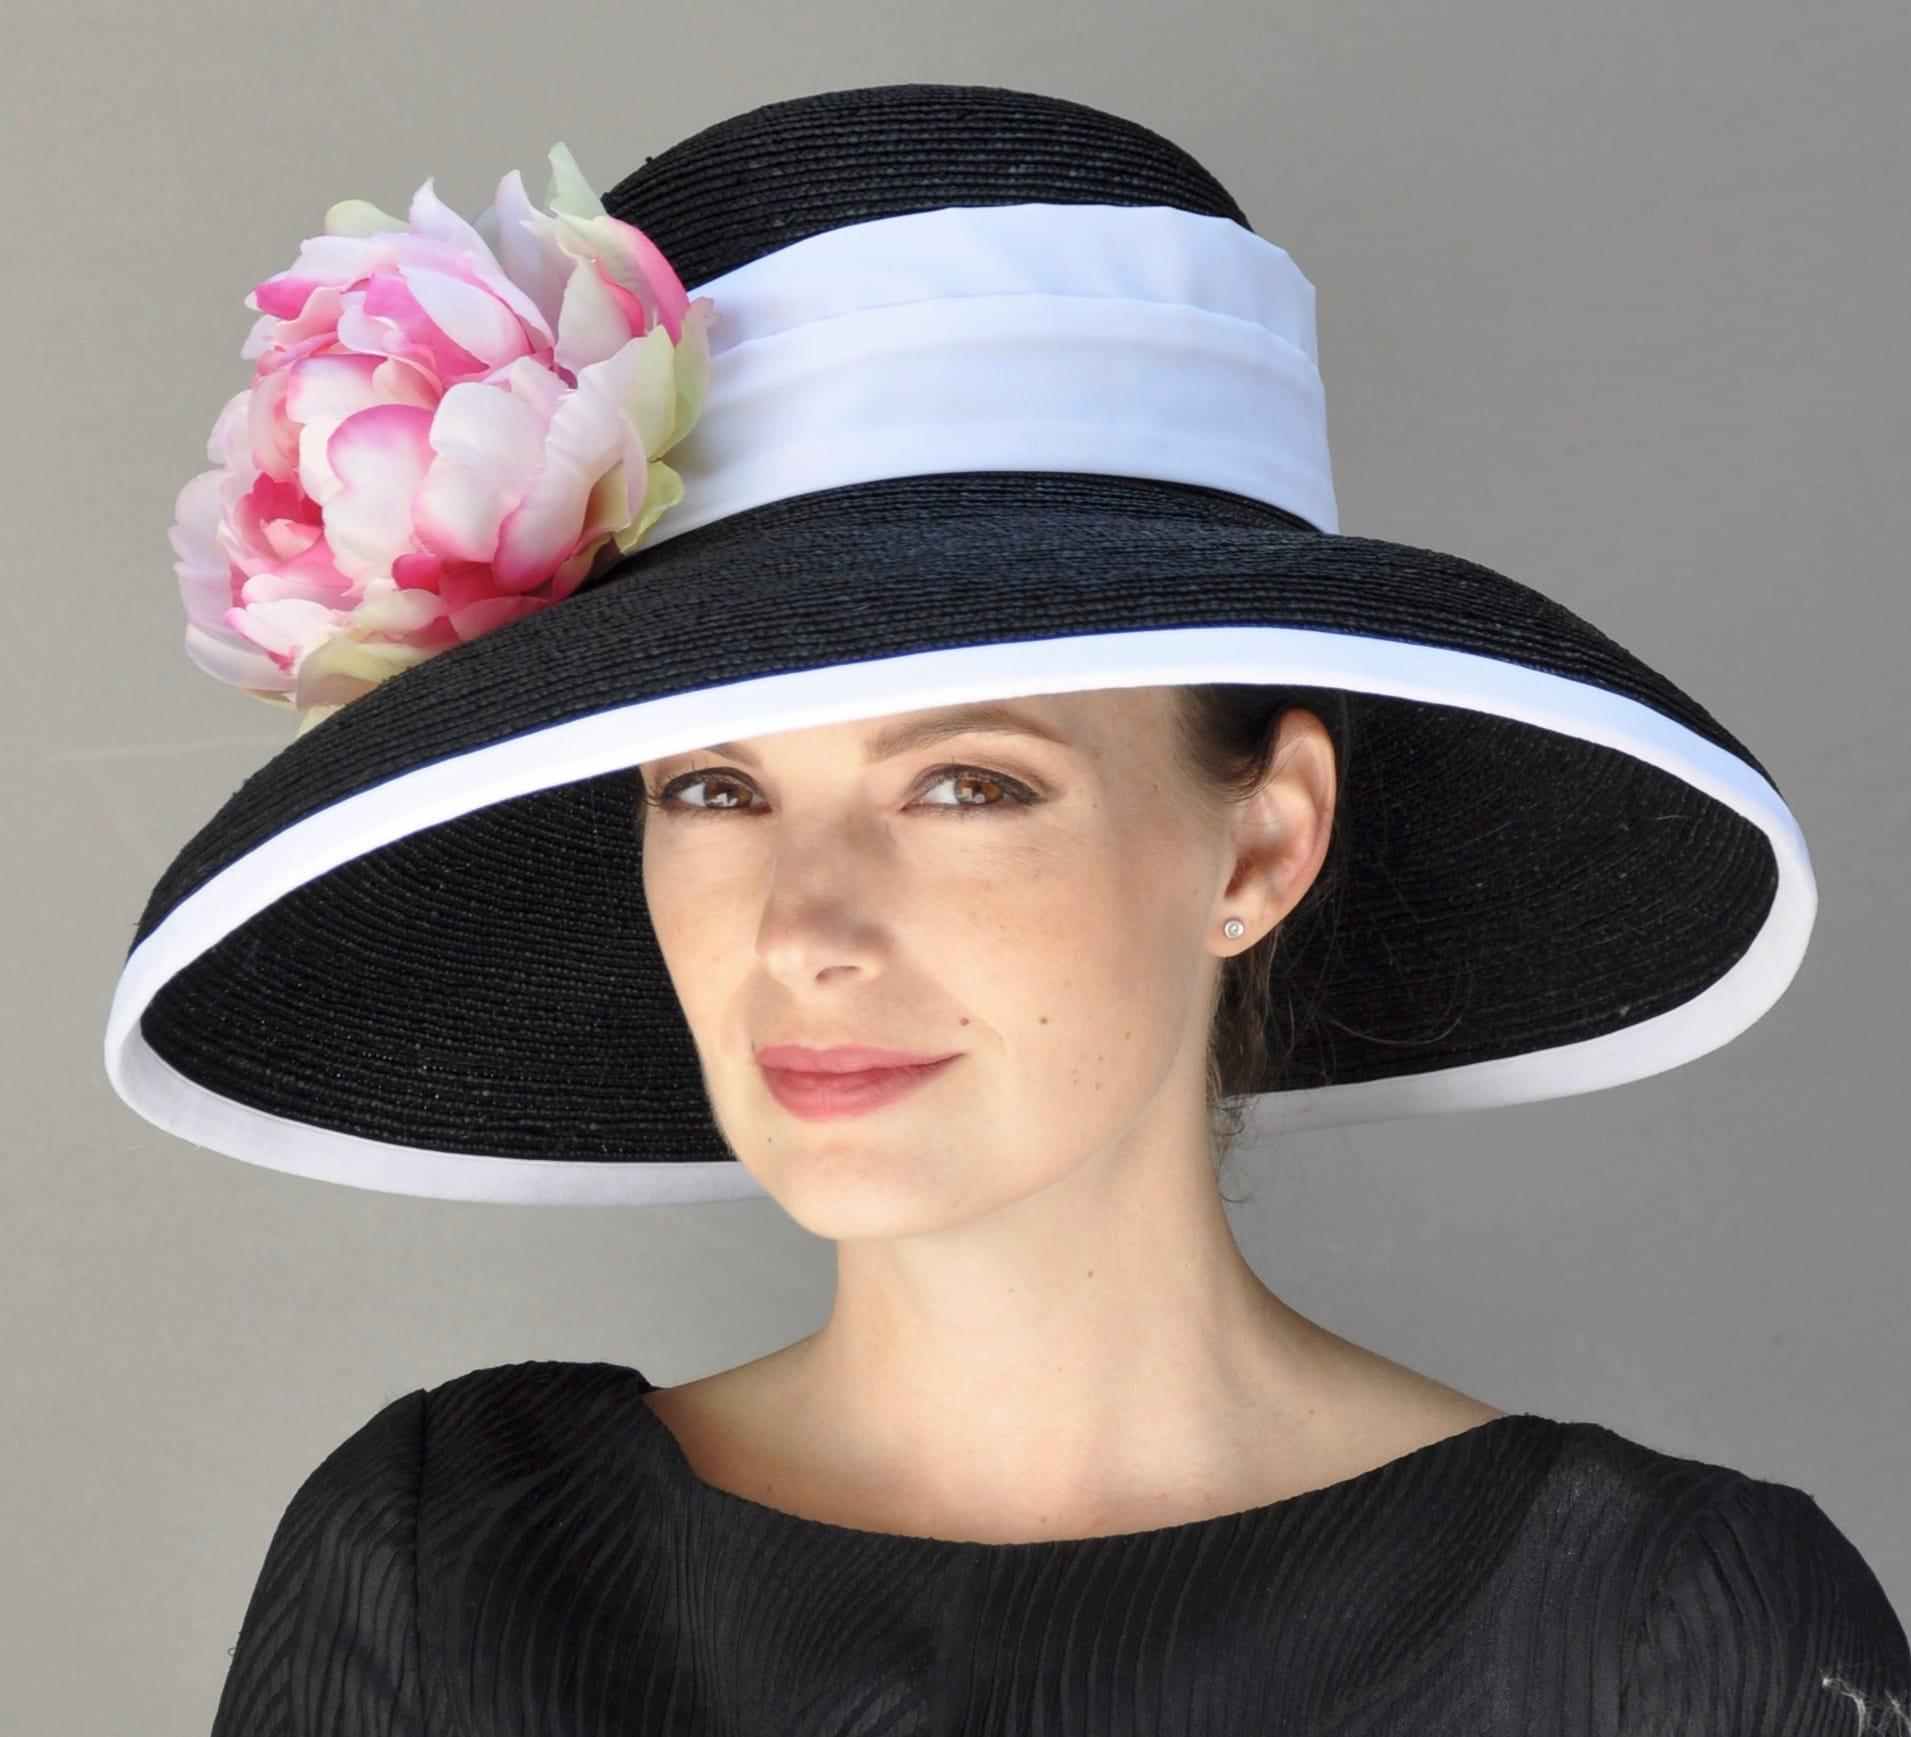 Derby Hat, Church Hat, Formal Hat, Black And White Hat